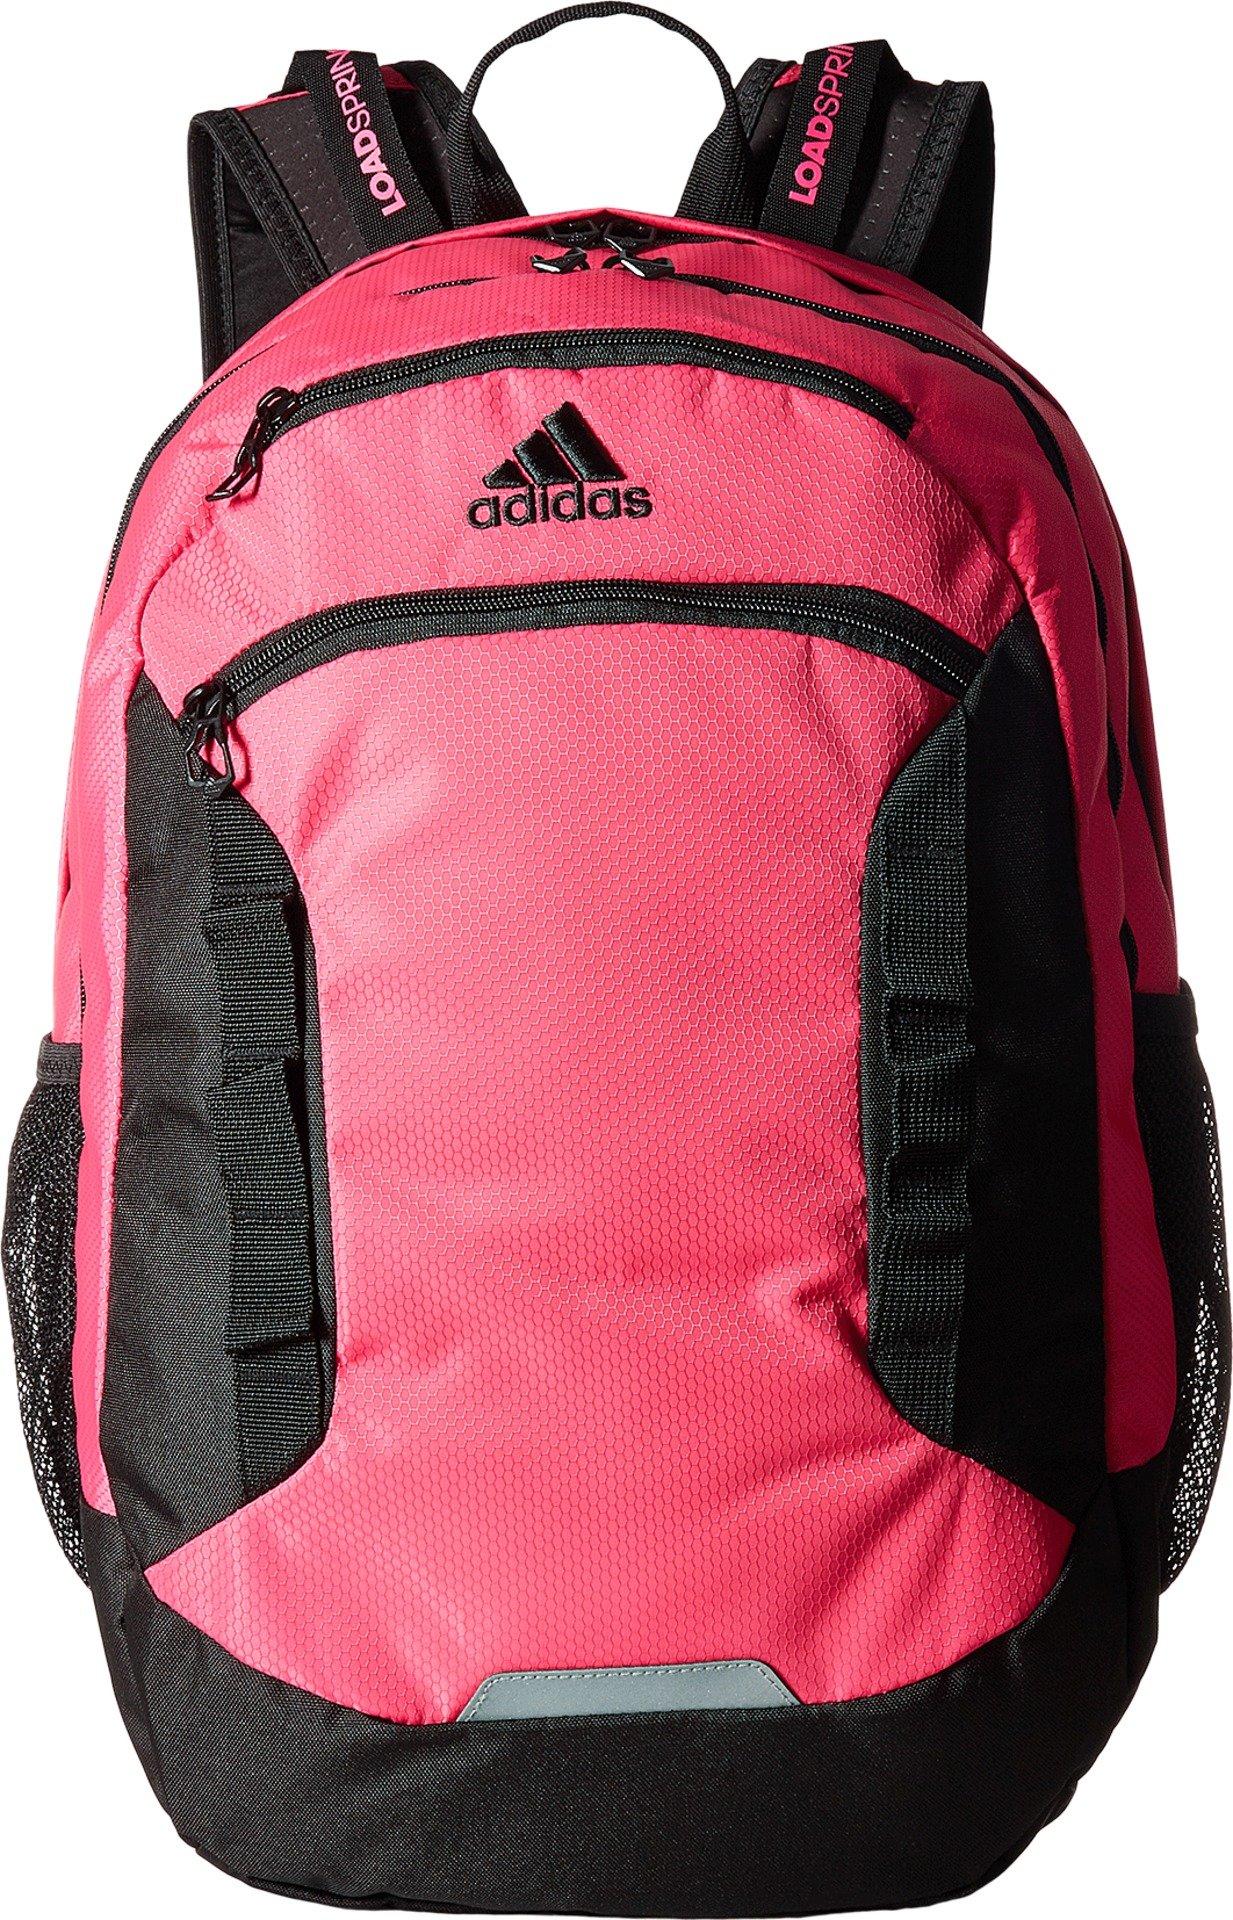 adidas Excel III Backpack, Shock Pink/Black/Grey, One Size